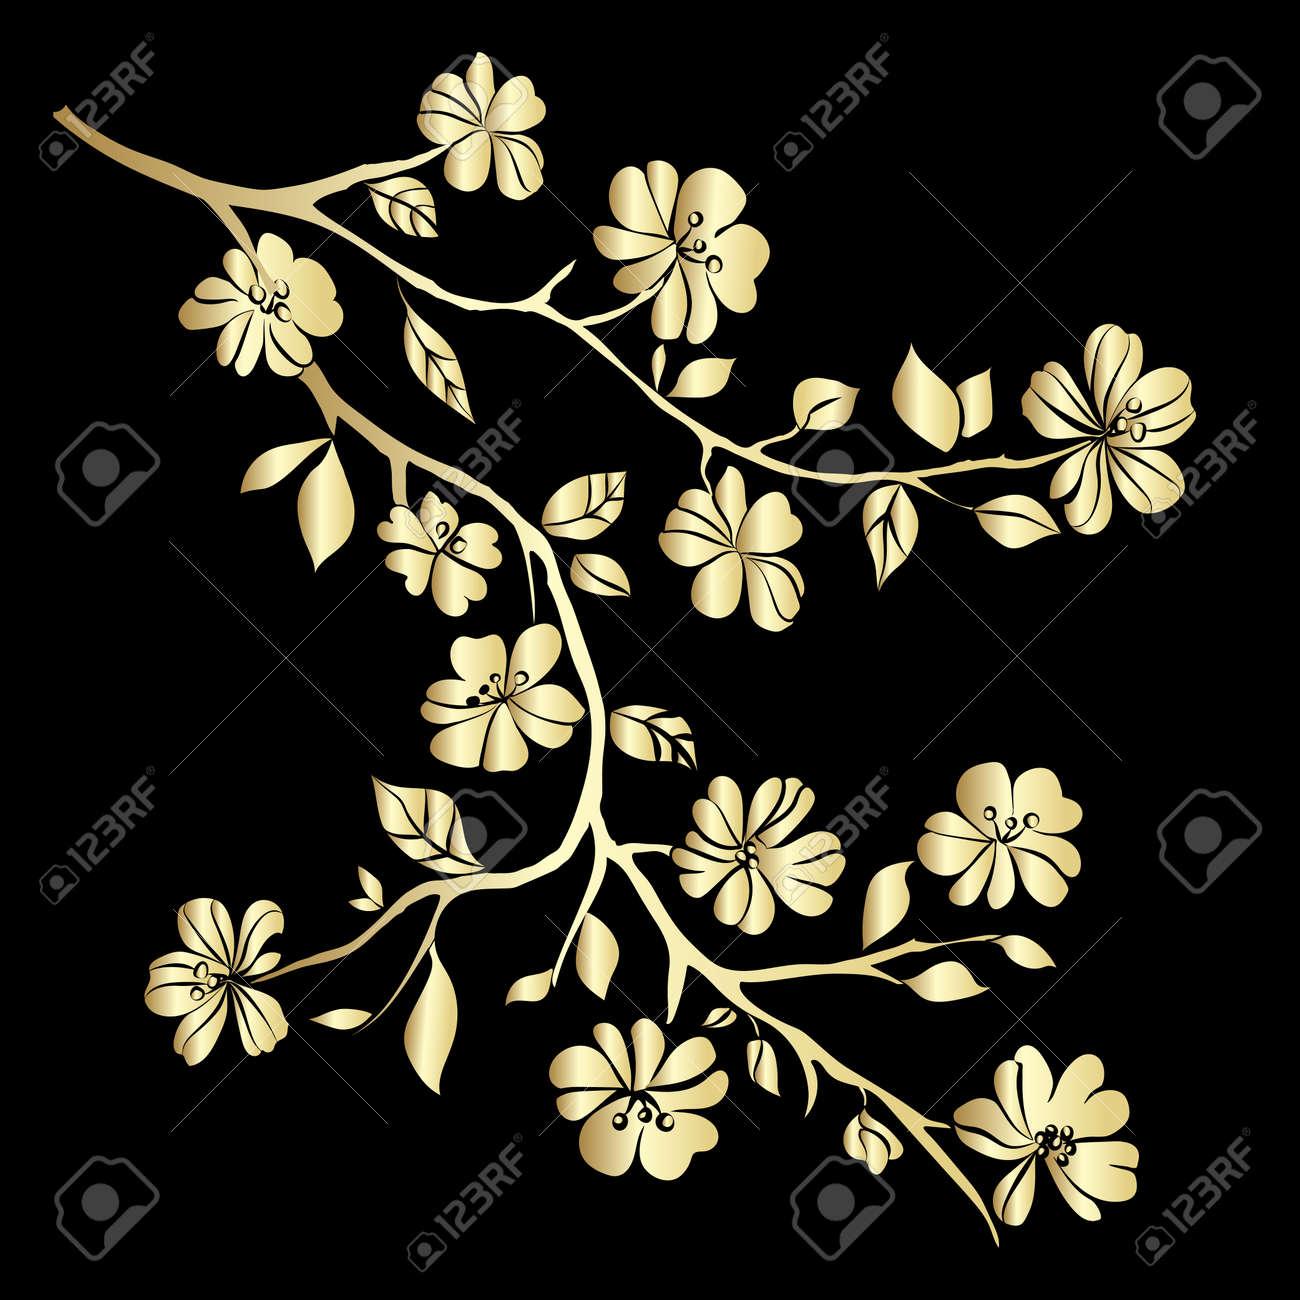 Gold twig sakura blossomson black background. Vector illustration - 42084350